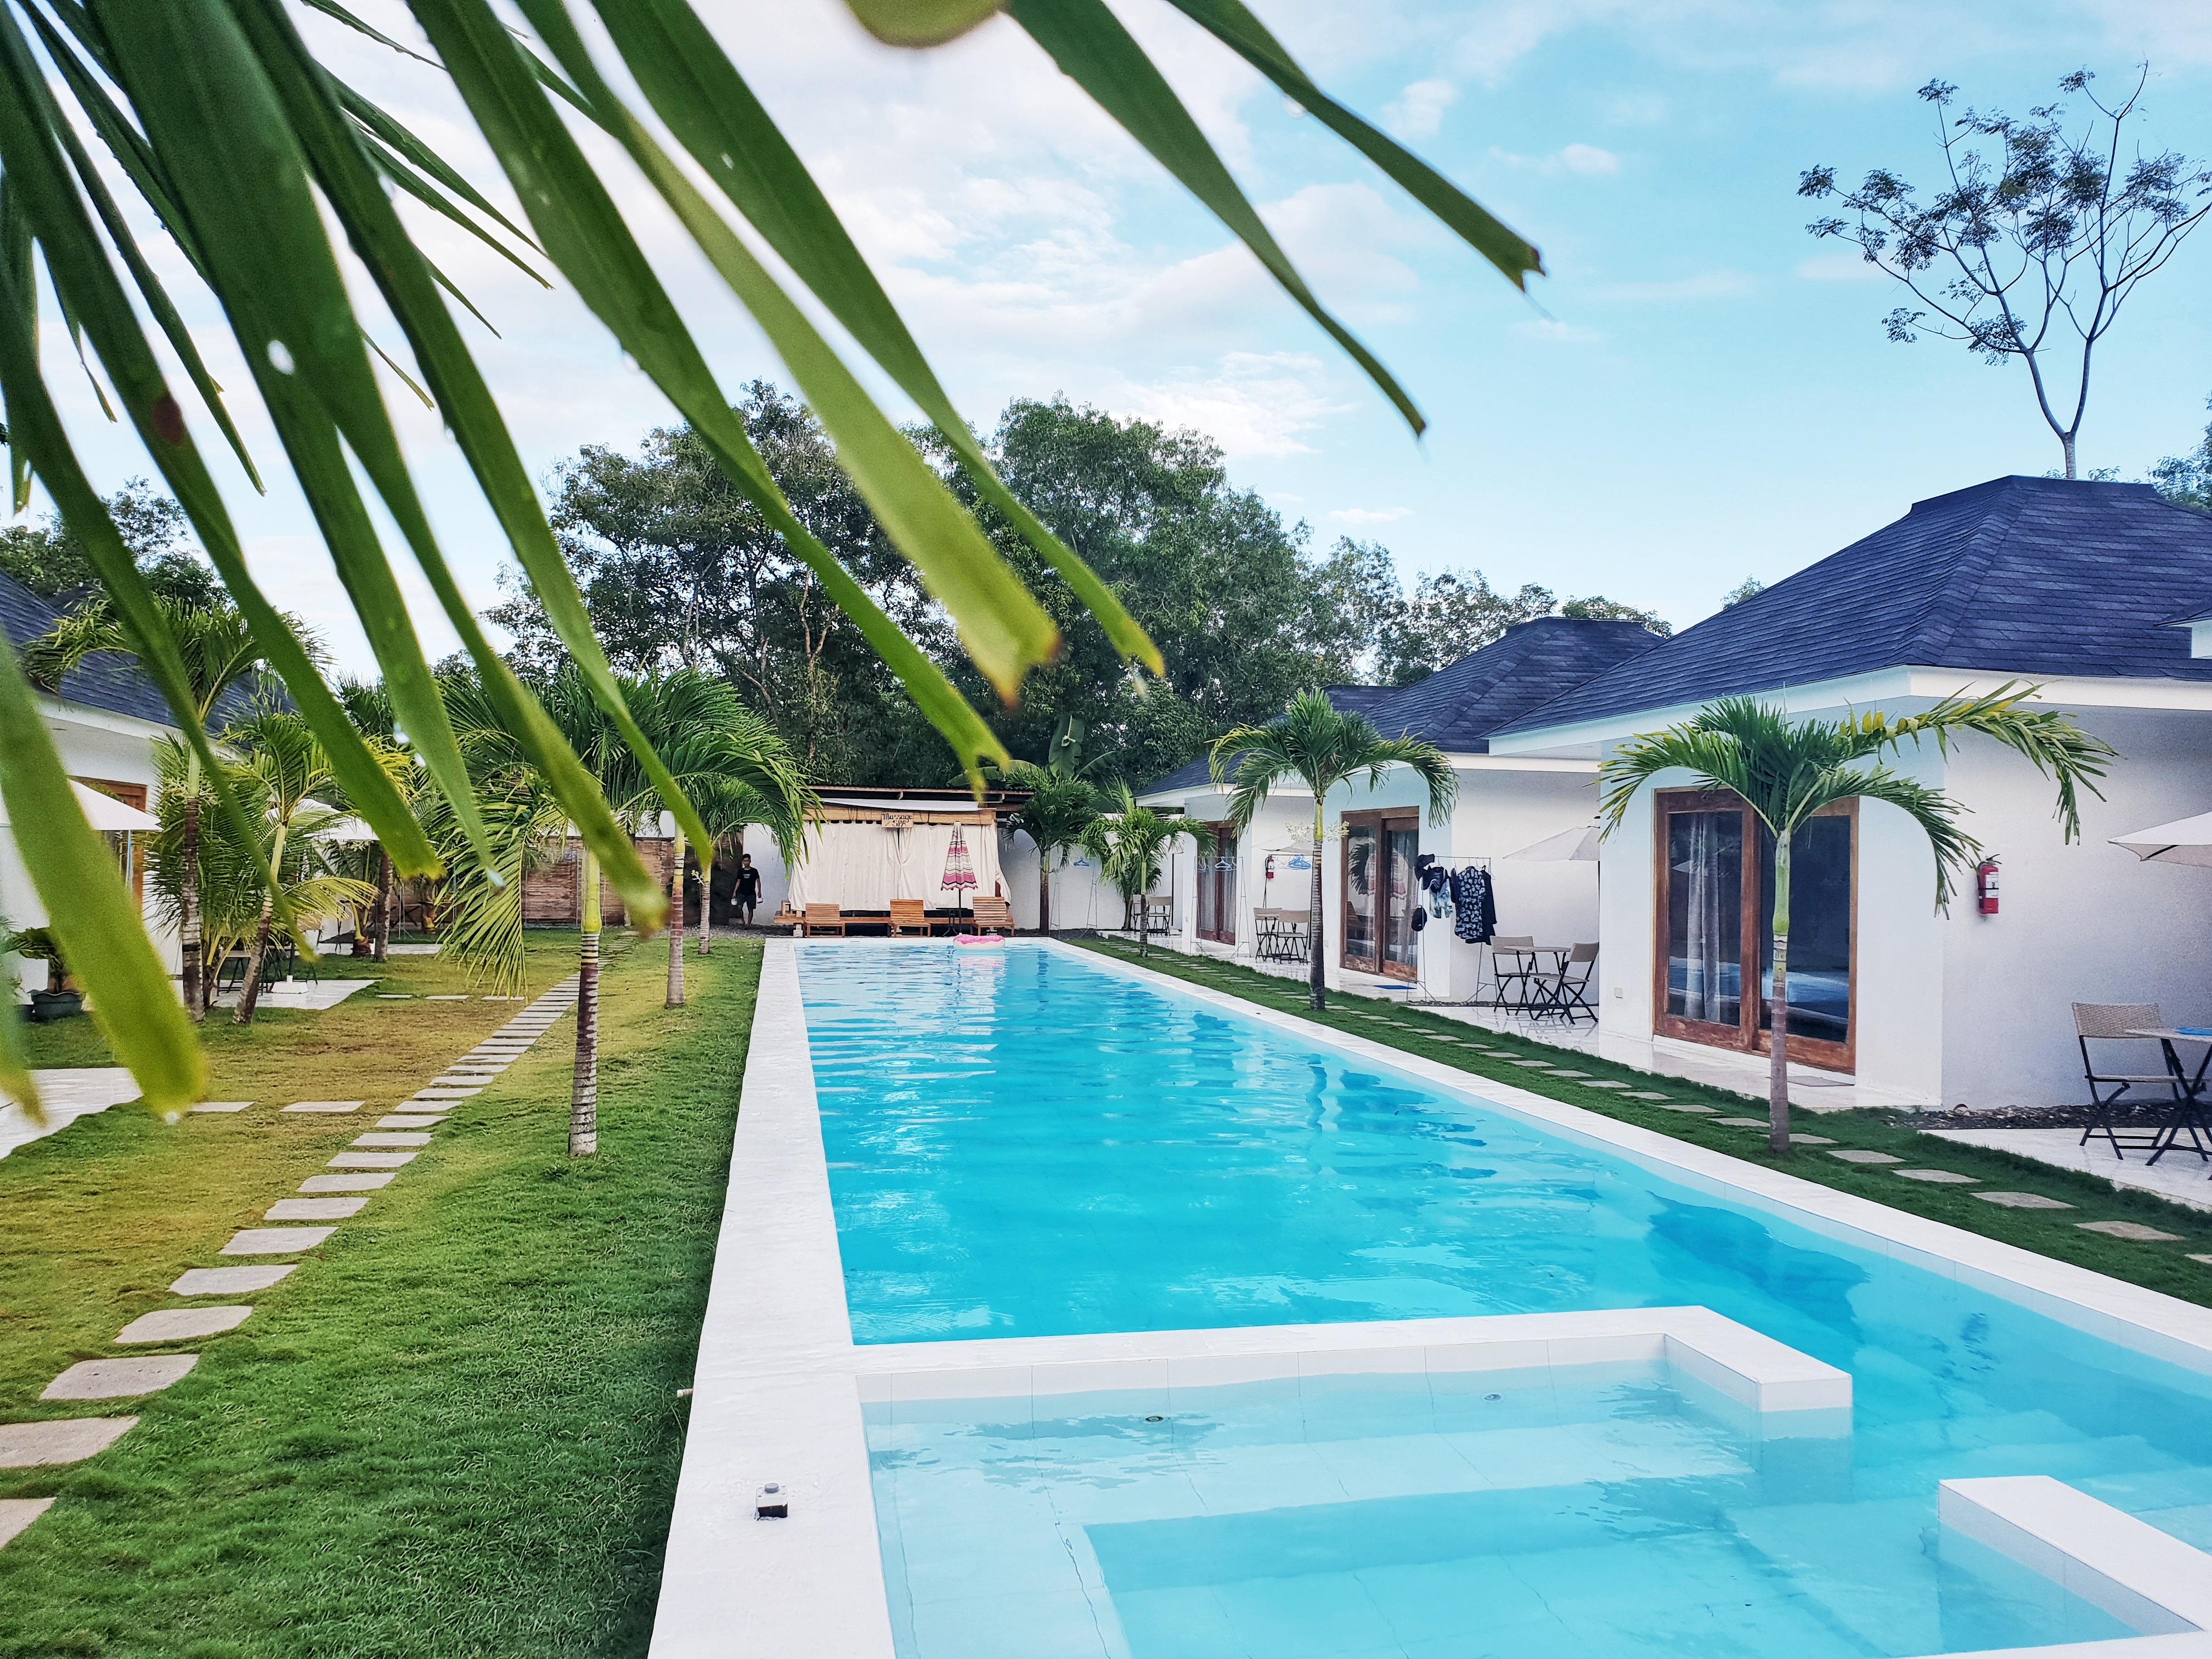 Island World Panglao Pool, Bohol, Philippines